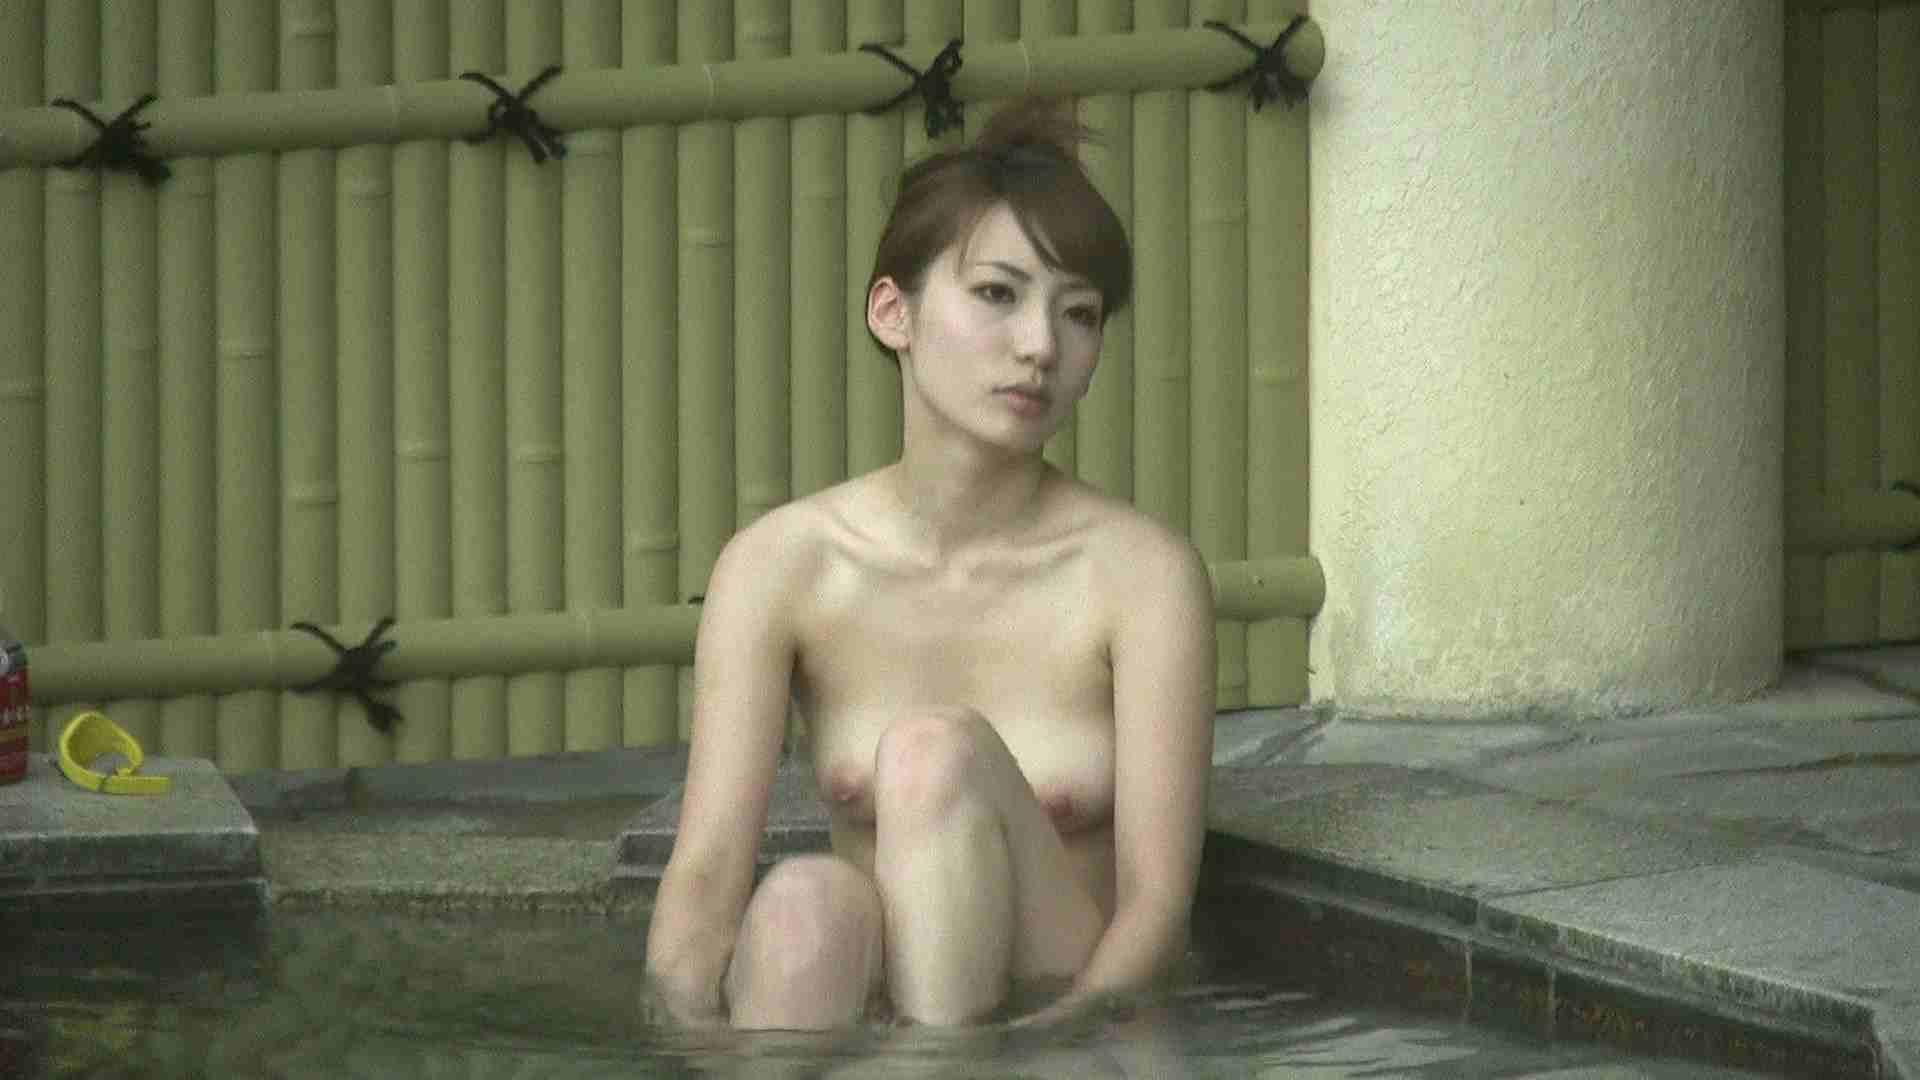 Aquaな露天風呂Vol.208 HなOL   盗撮  101pic 50